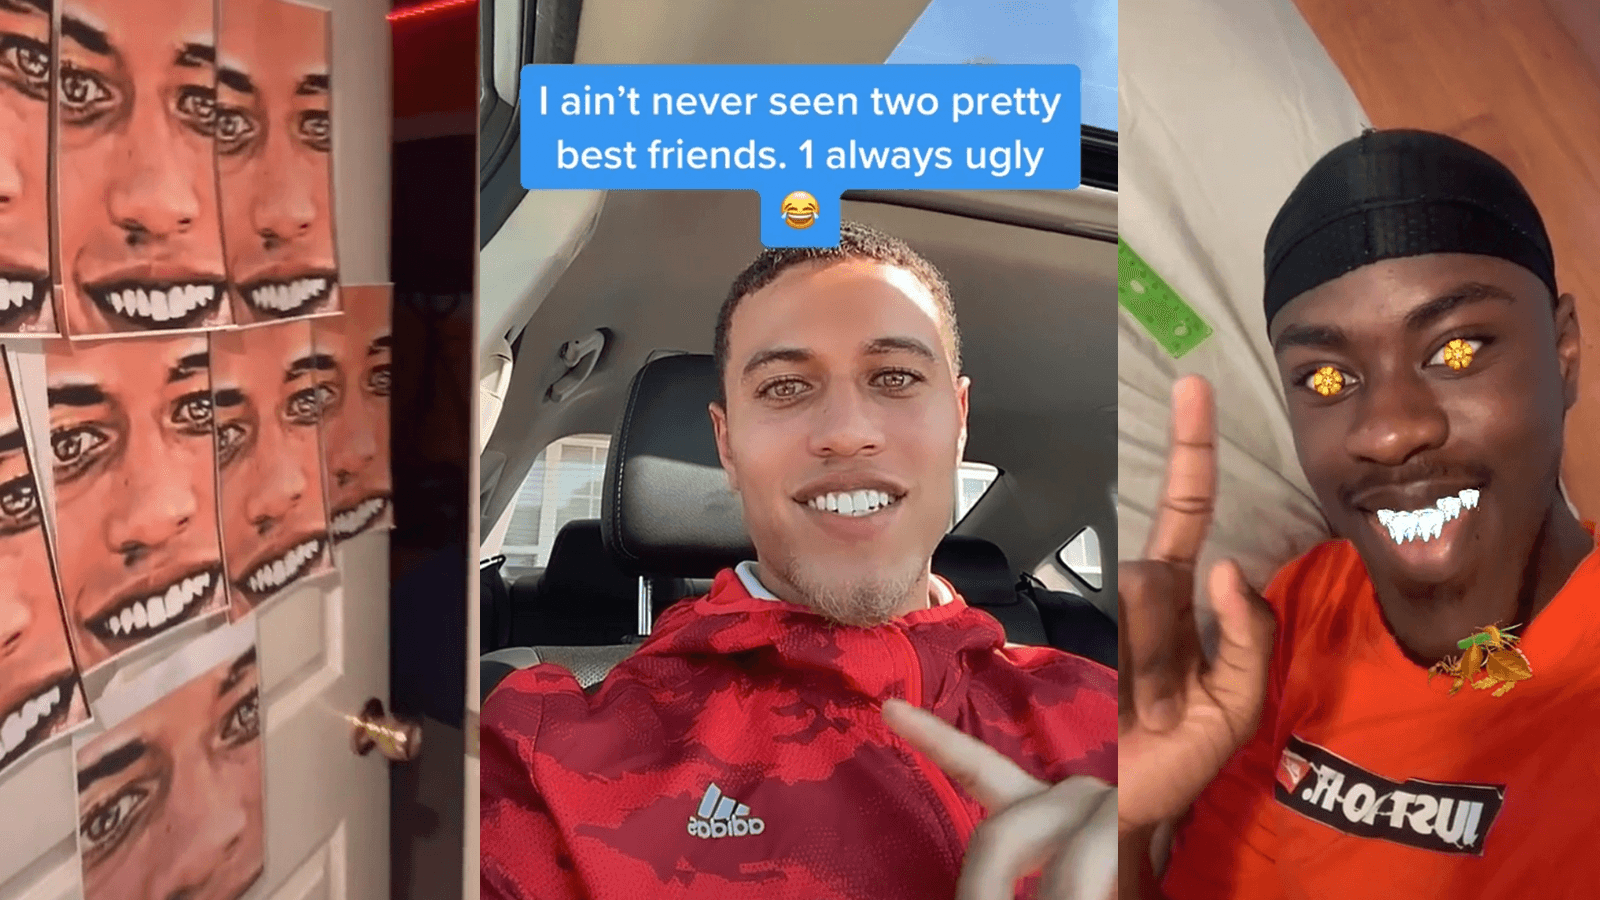 Two pretty best friends meme tiktok